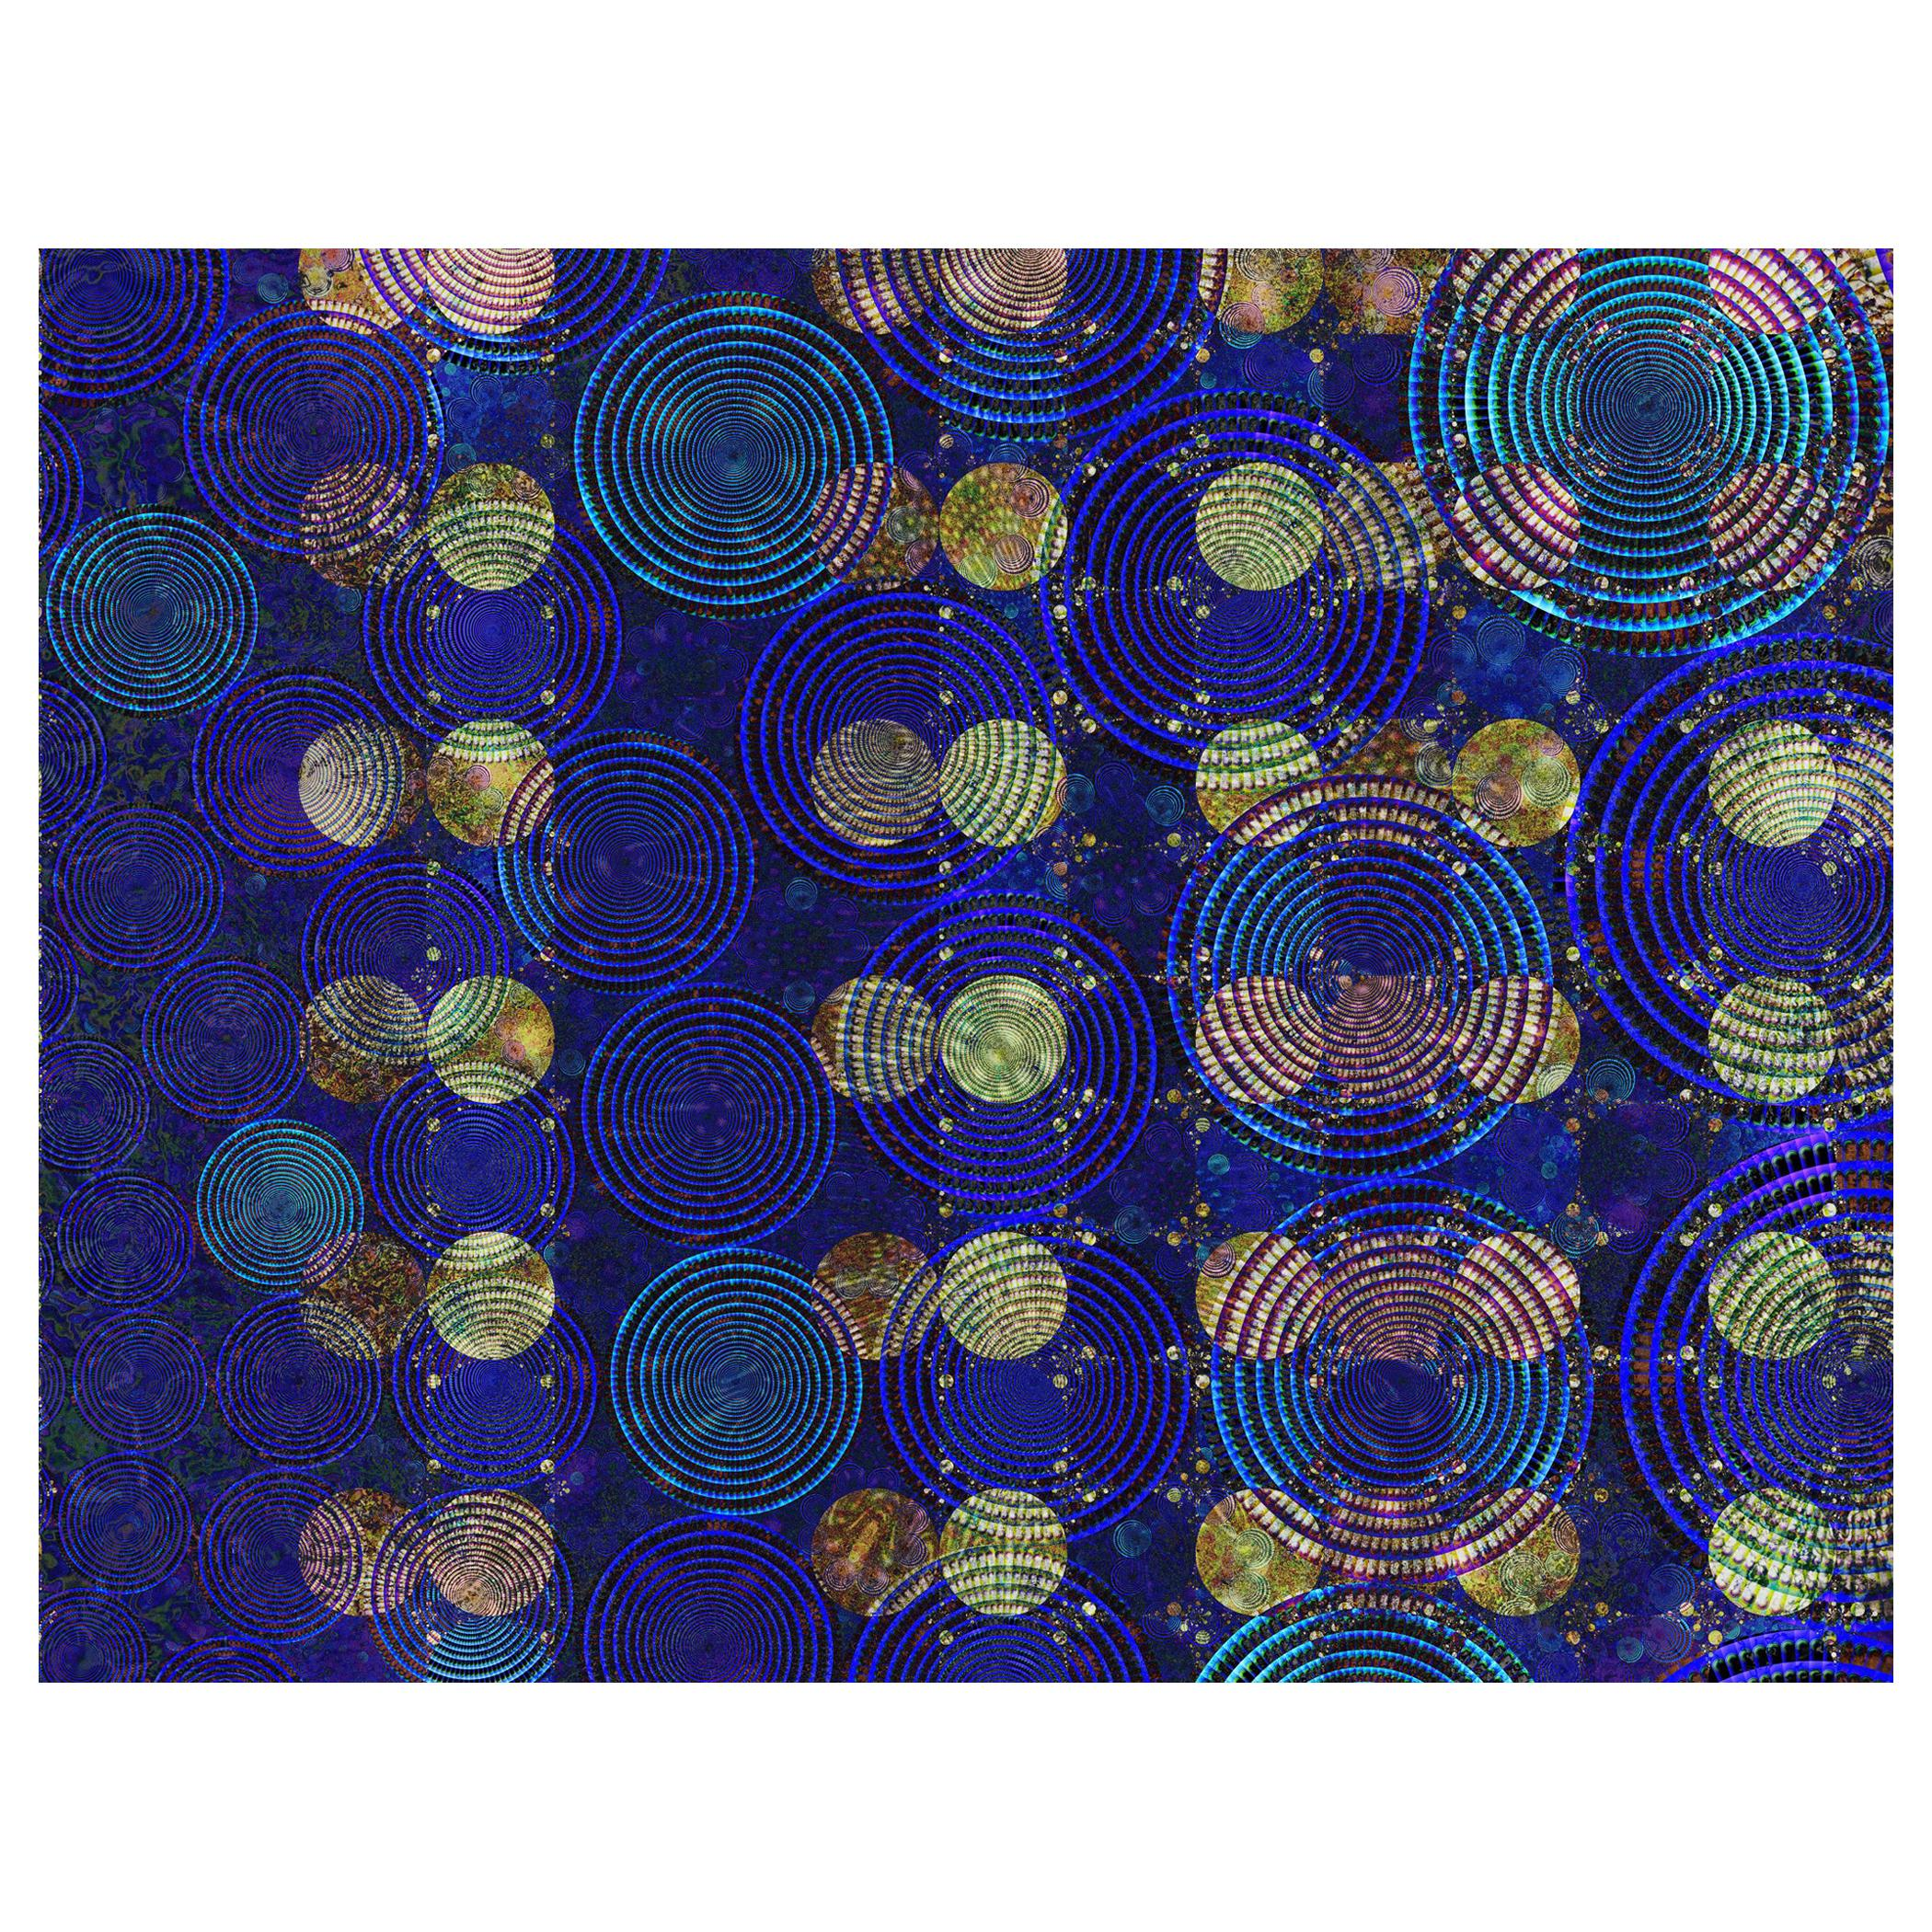 "Abstract Archival Digital Fine Art Print, William P. Montgomery, ""Night Vision"""